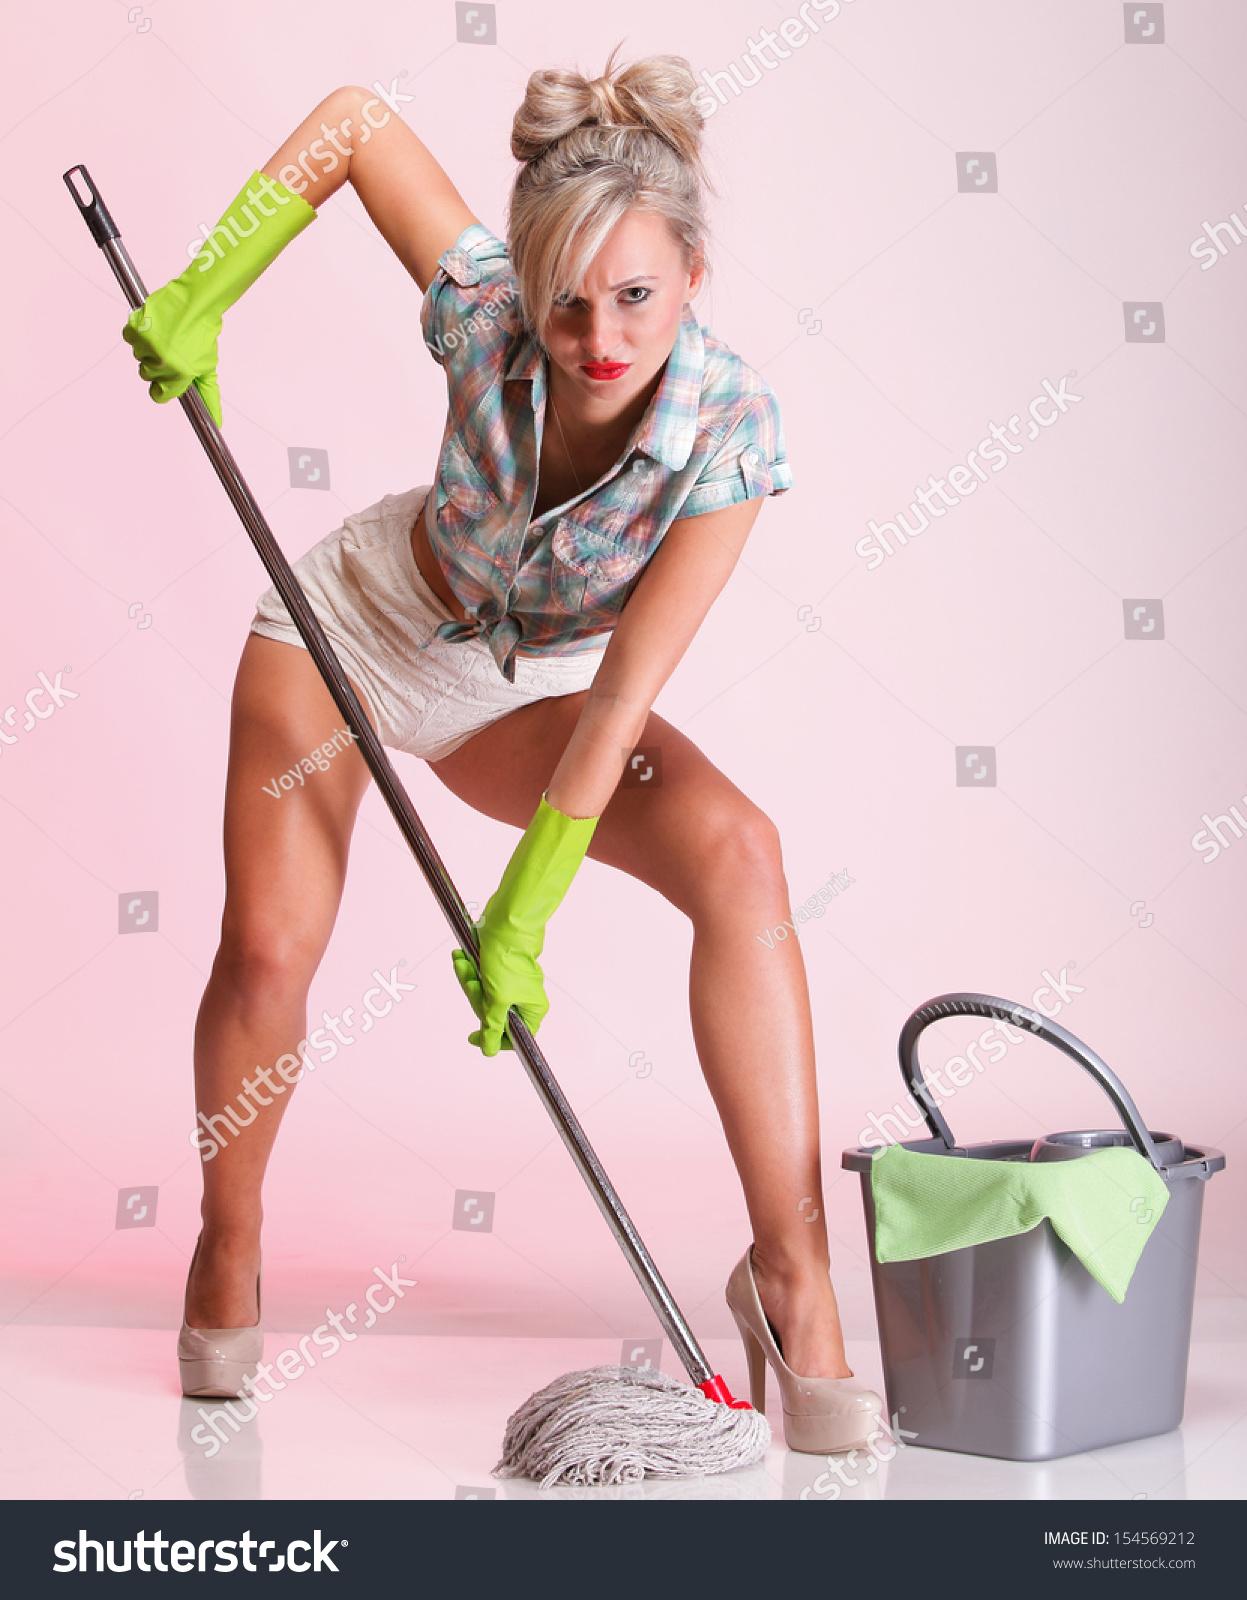 Maids N Heels - An Erotic Maid & Companionship